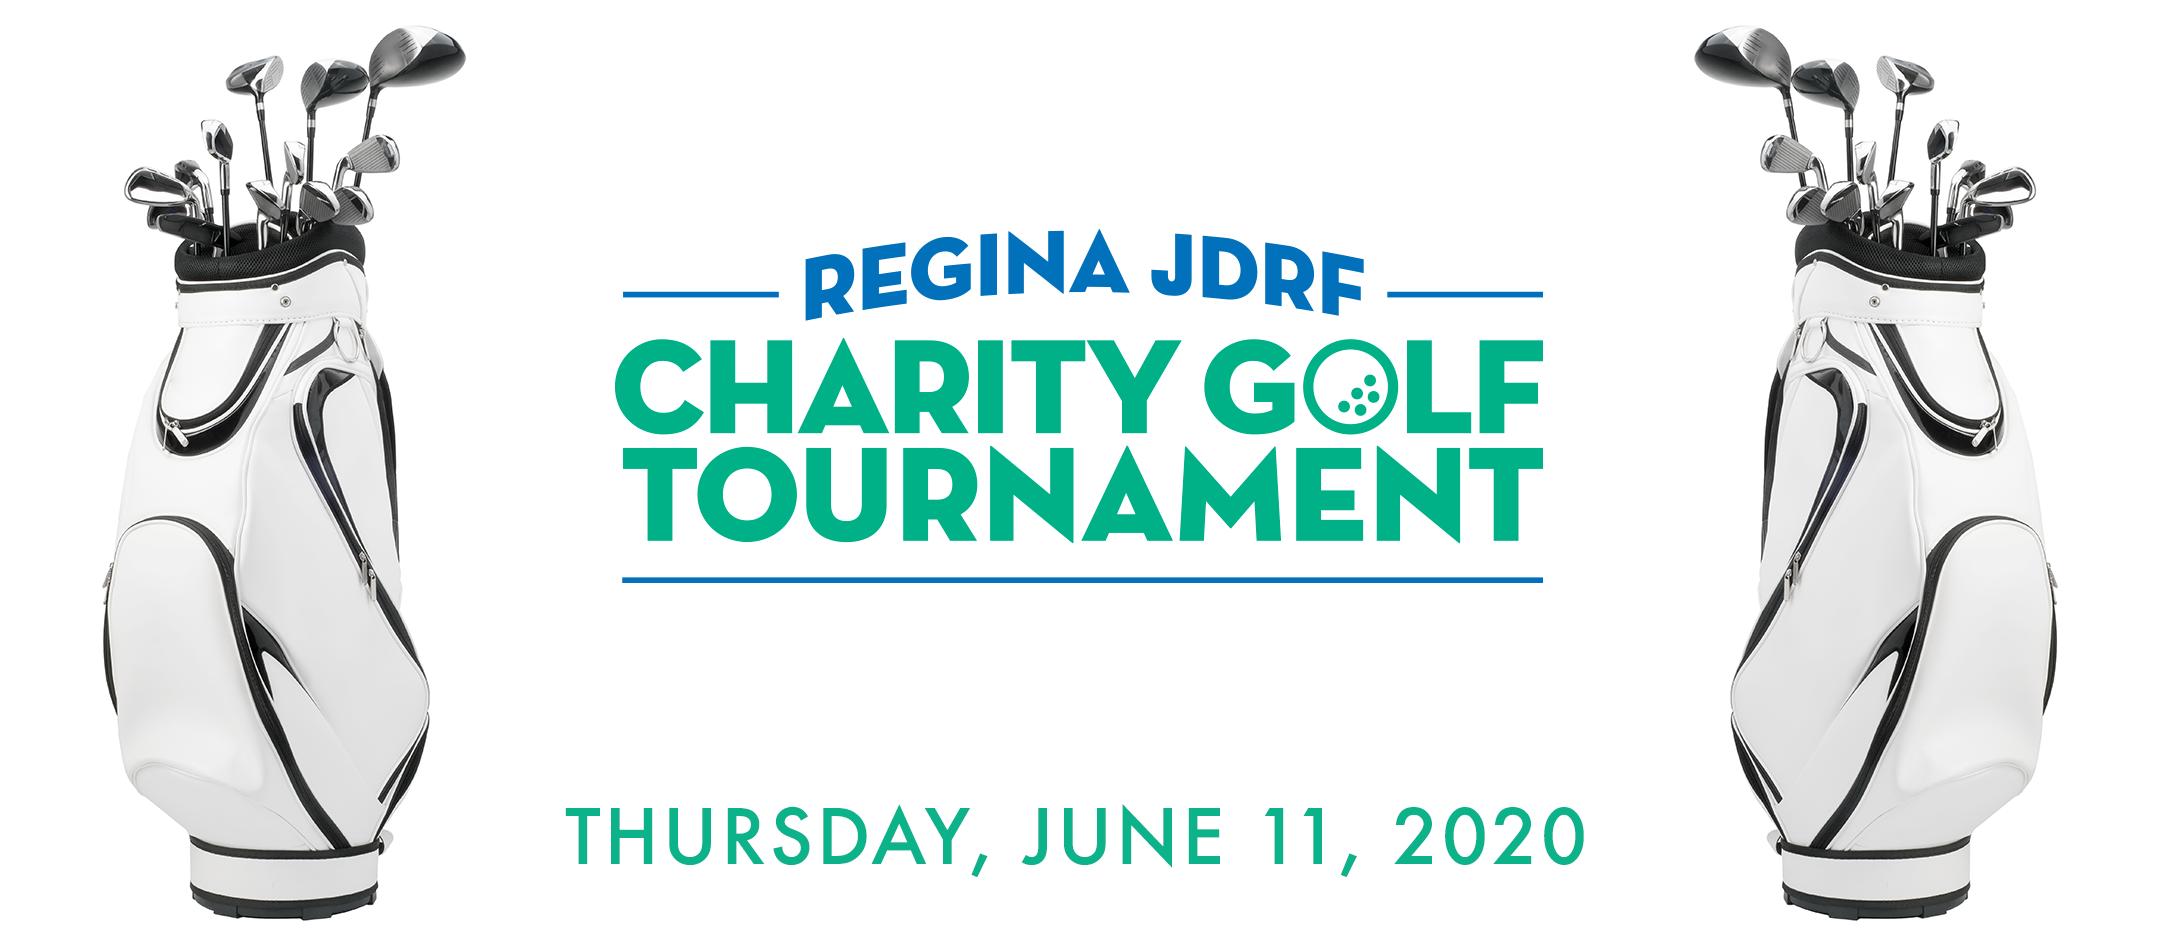 Regina JDRF Charity Golf Tournament